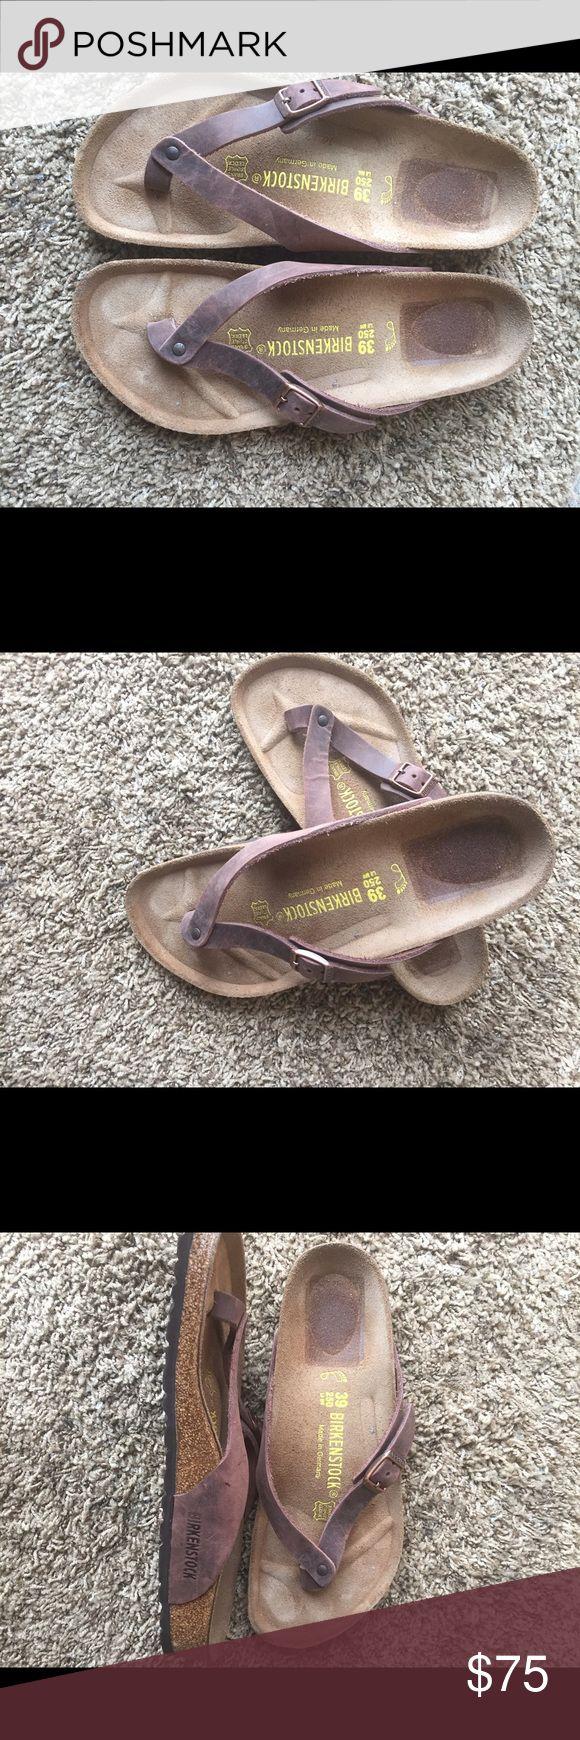 Birkenstock Adria Sandal size 39/9 New Birkenstock Adria Sandal size 39/9; NEW; NWOT; bought and were too big; Hard to find style; great price; no trades. Birkenstock Shoes Sandals